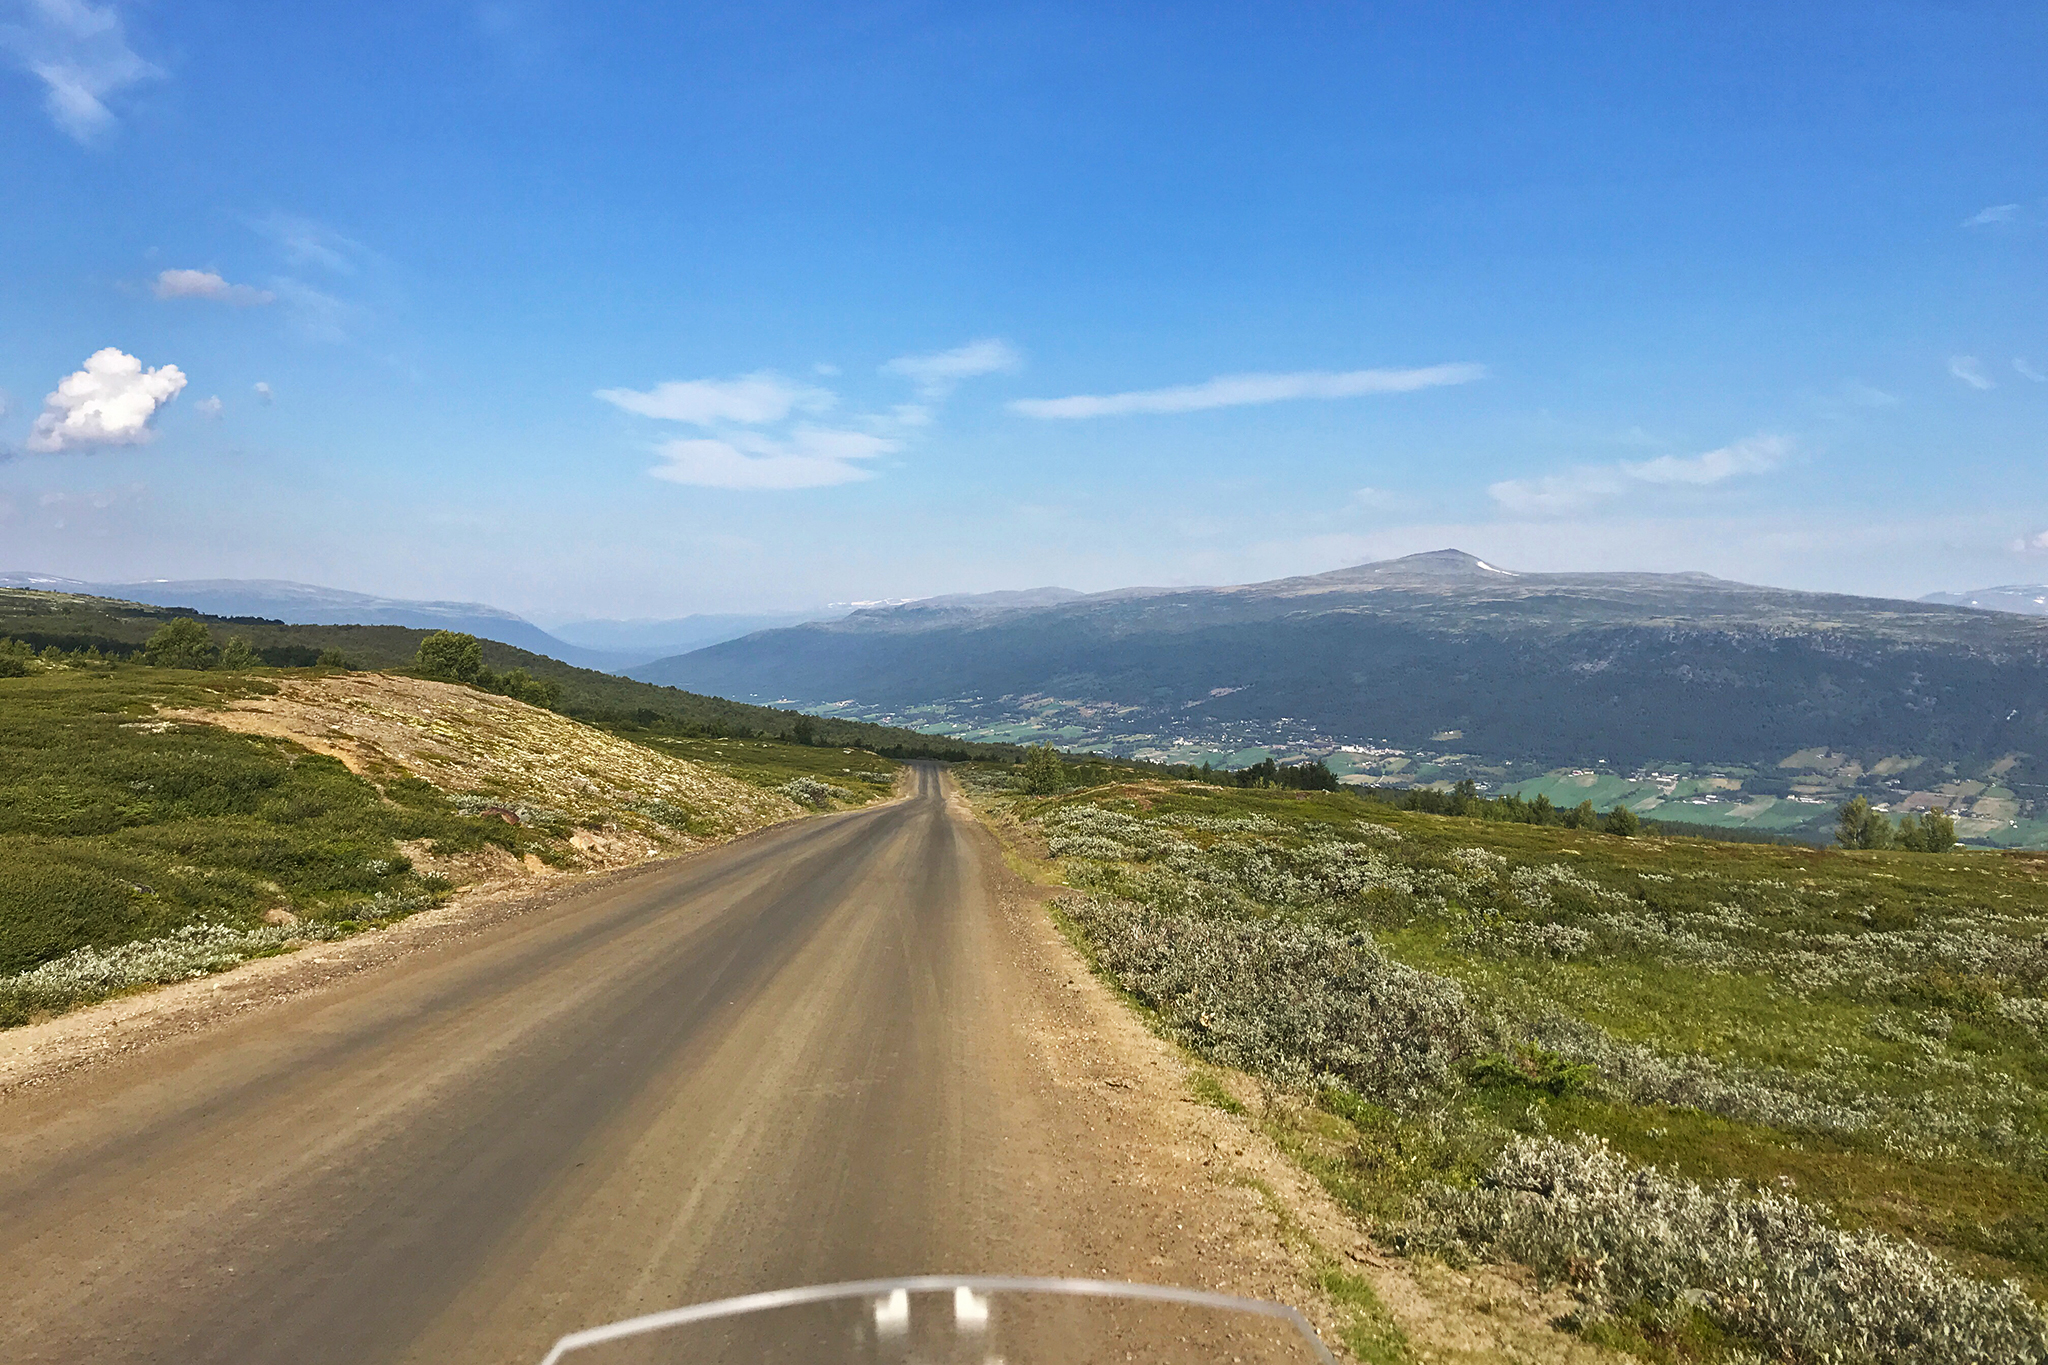 To Trollstigen: Slådalsvegen, towards Lesja. In the rear, Dovrefjell–Sunndalsfjella National Park